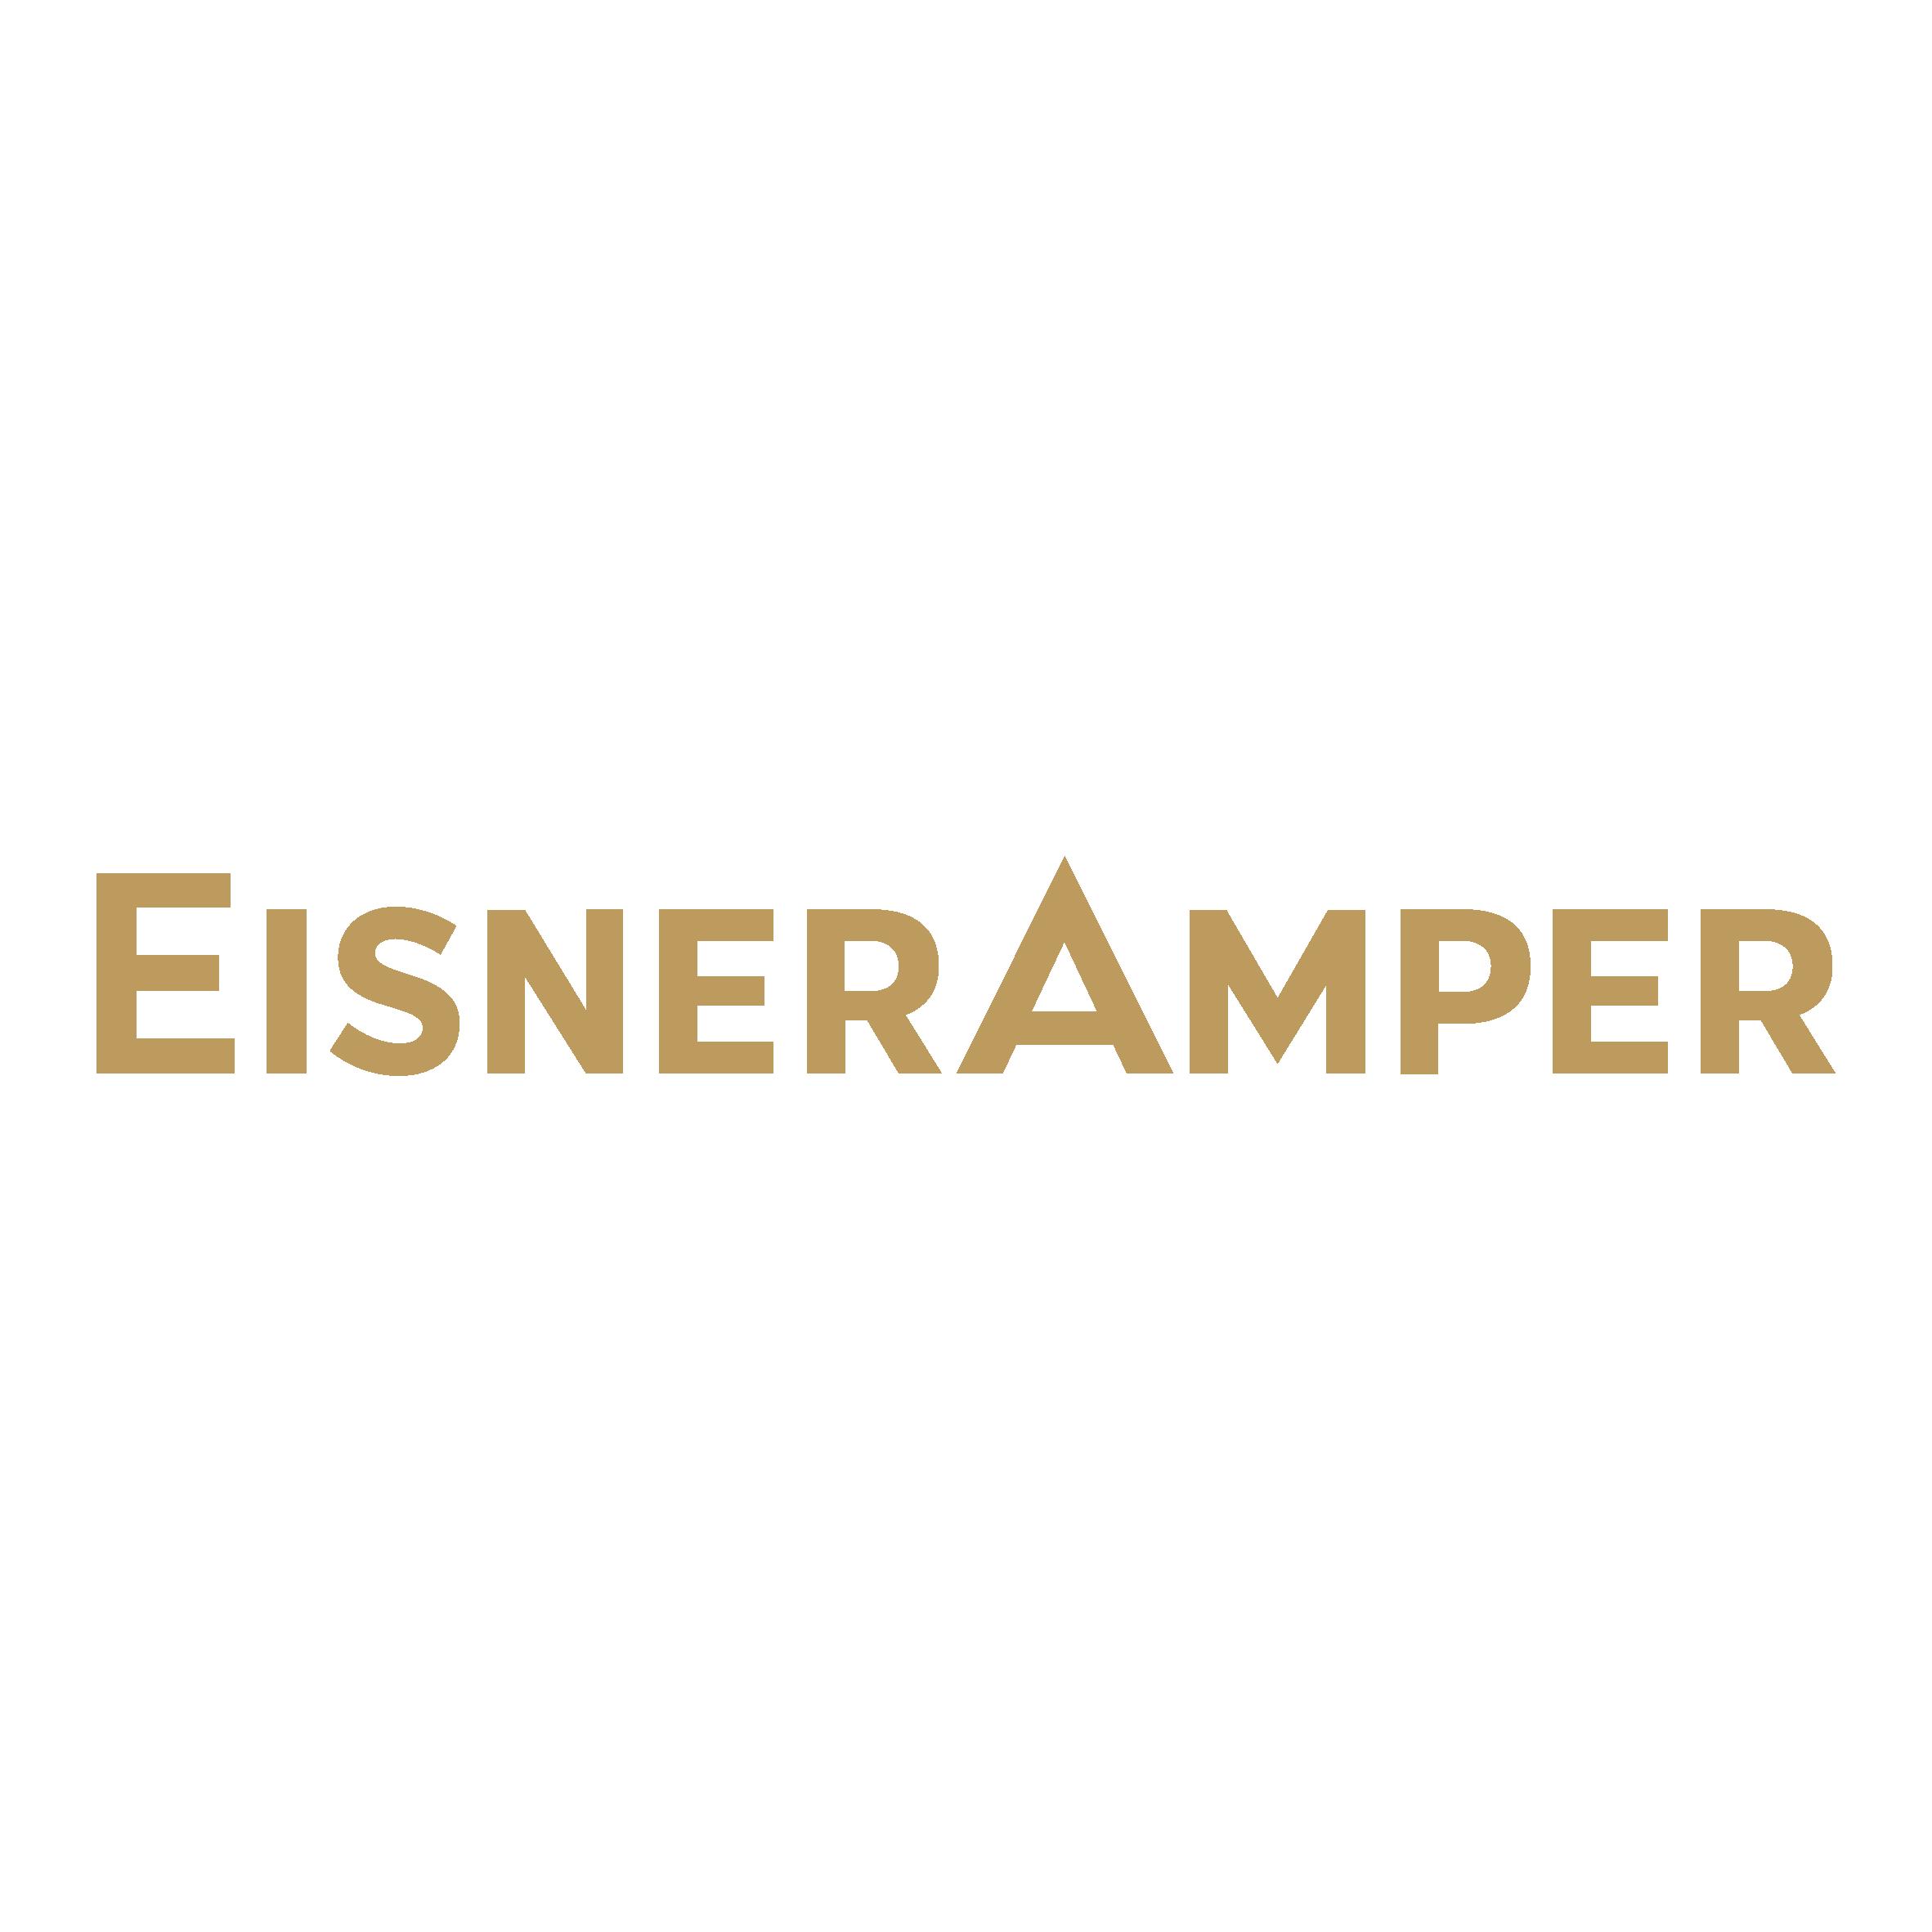 EisnerAmper logo.